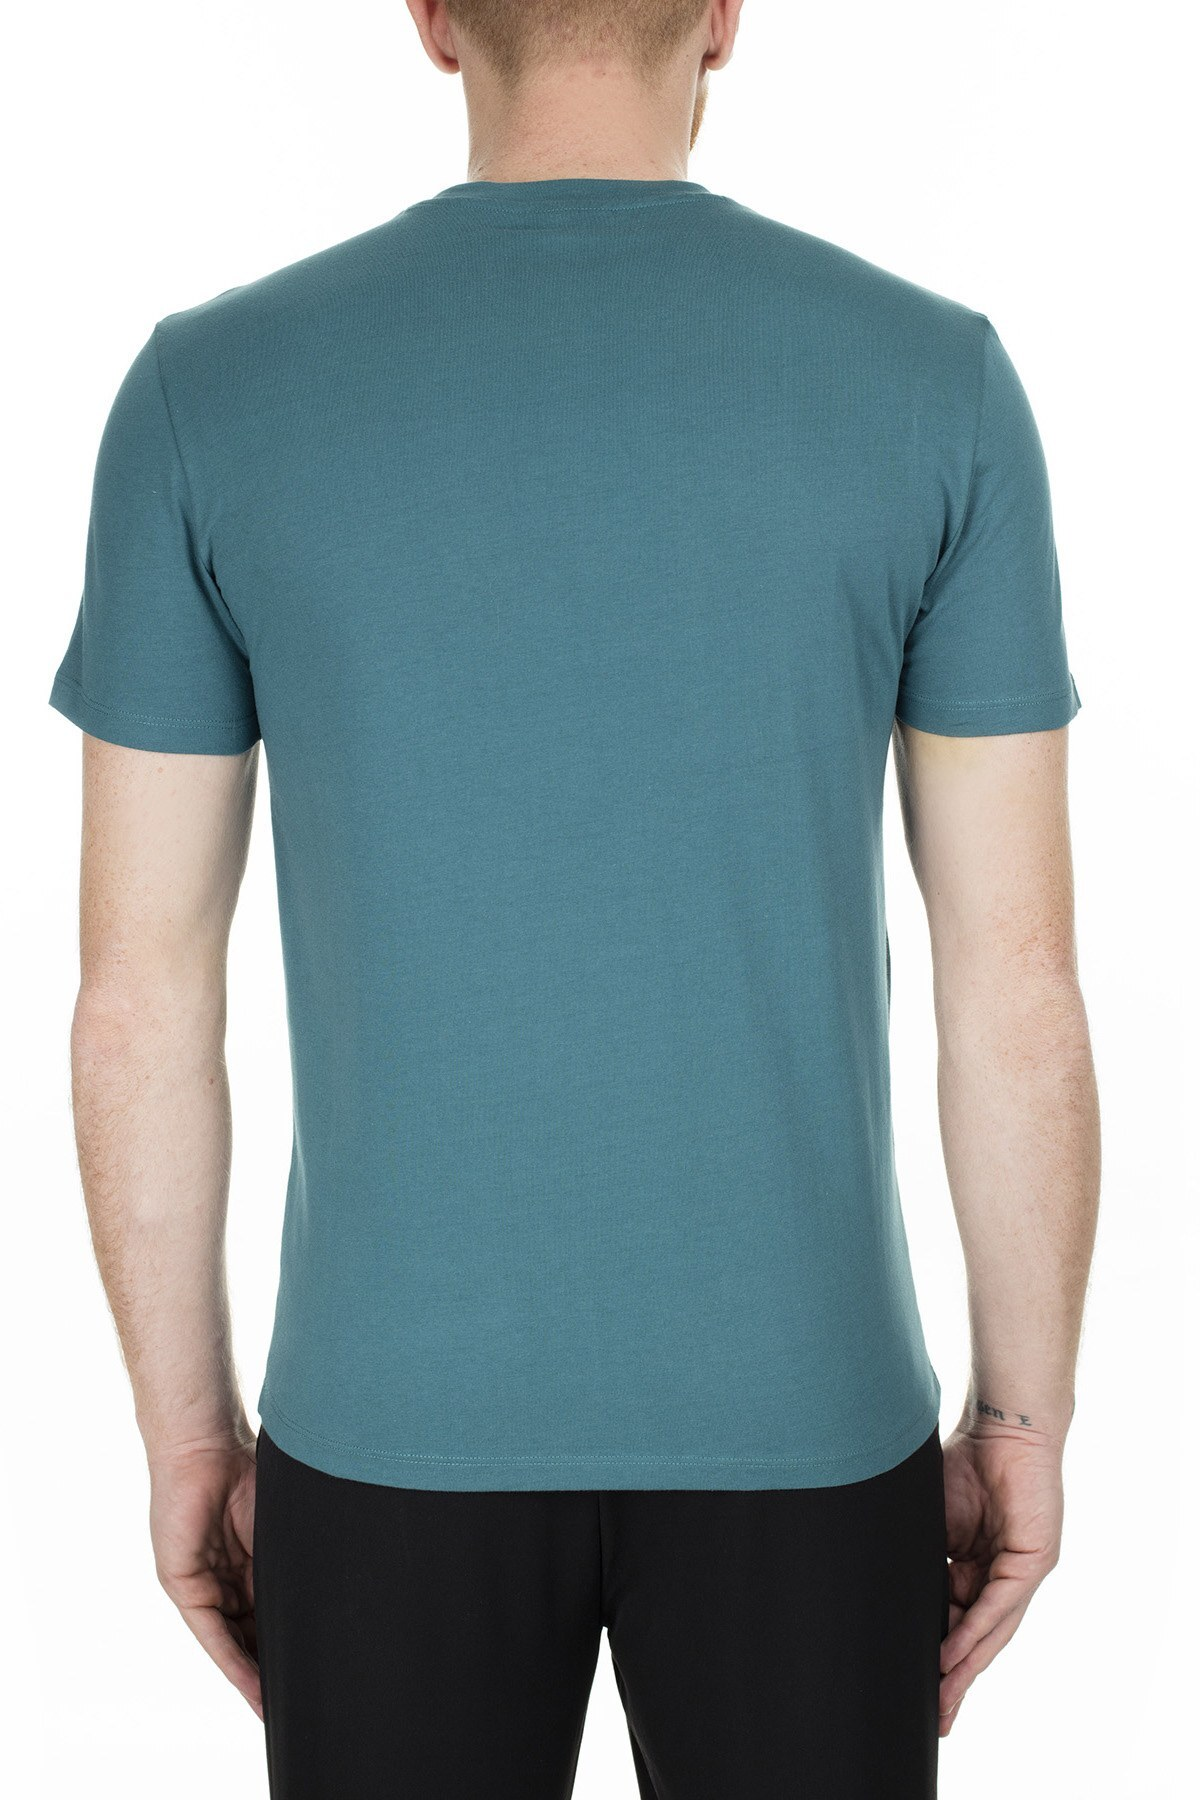 Emporio Armani Erkek T Shirt 6G1TC4 1J00Z 0956 PETROL